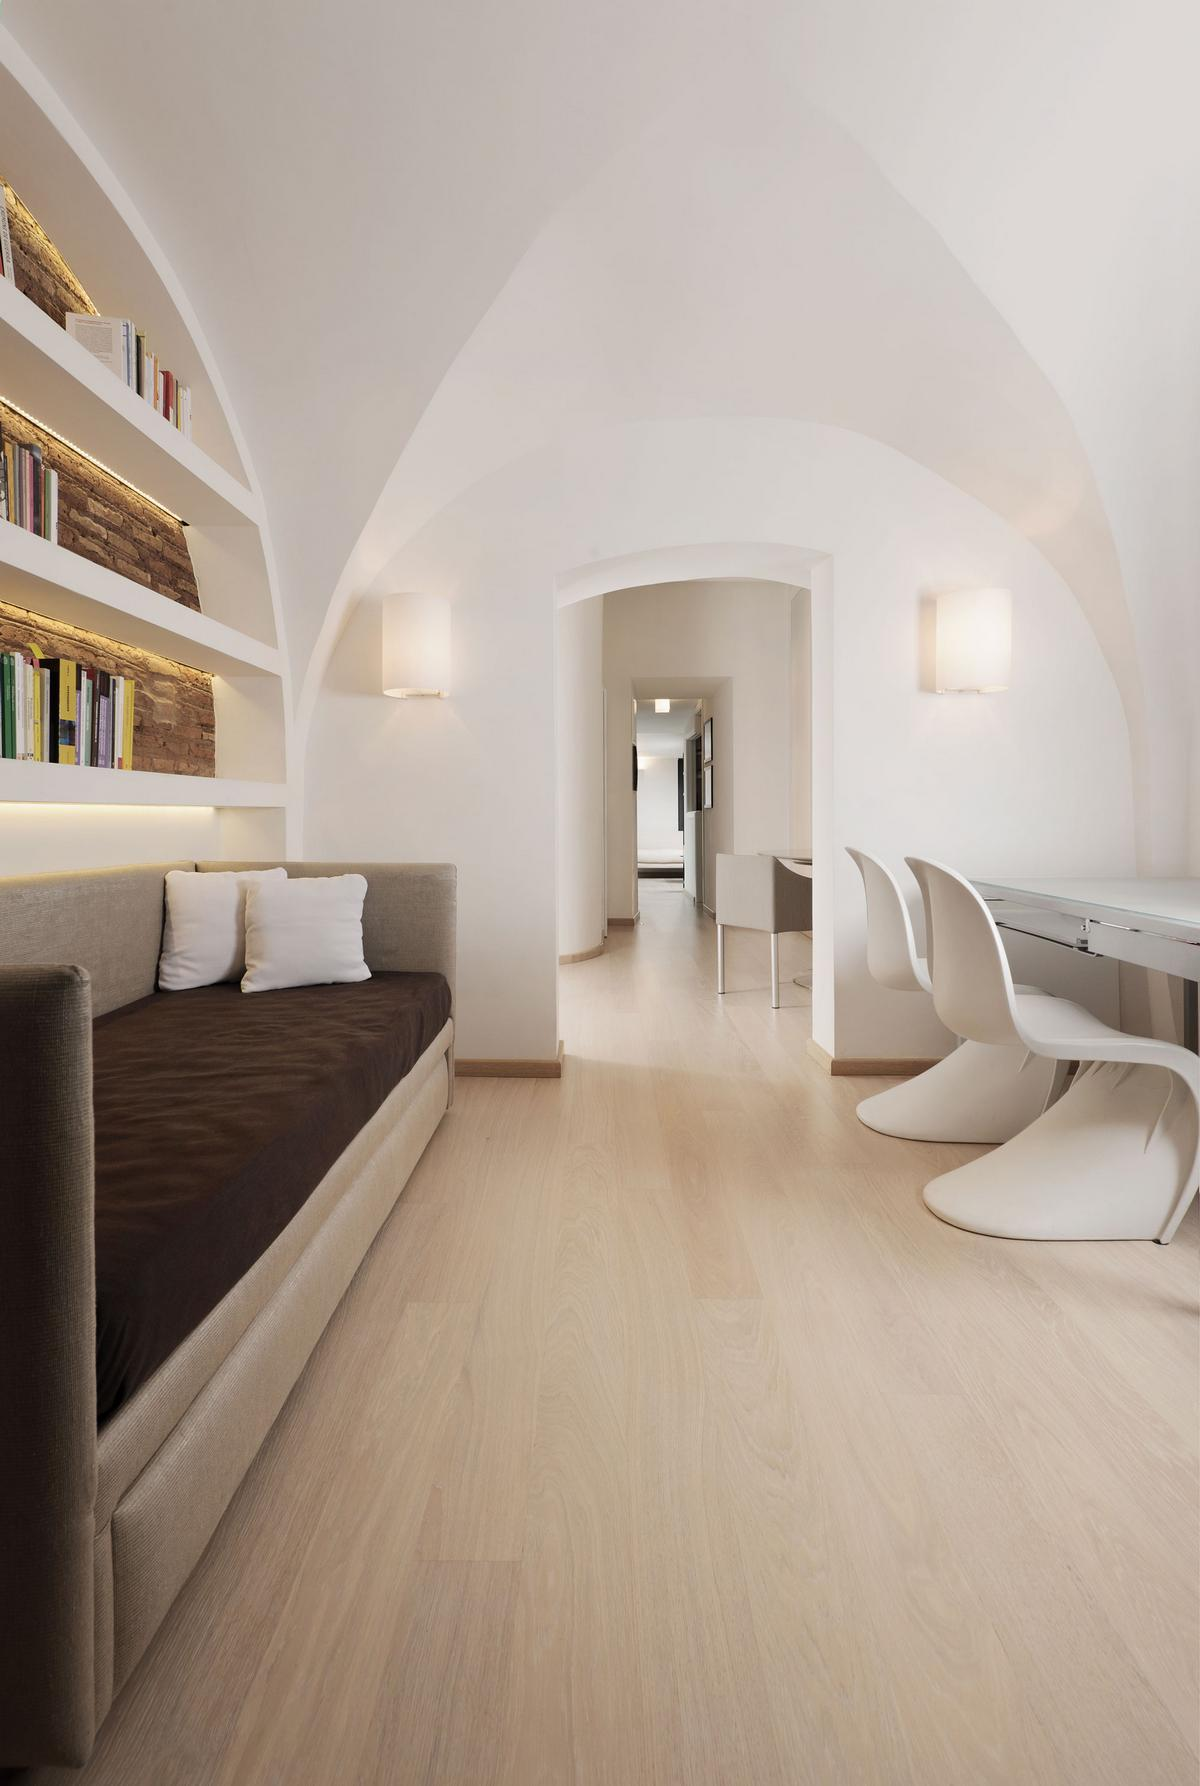 Carola Vannini Architecture, Poetic Apartment, квартира в Риме, недвижимость в историческом районе Рима, апартаменты в Италии, дизайн в стиле минимализма